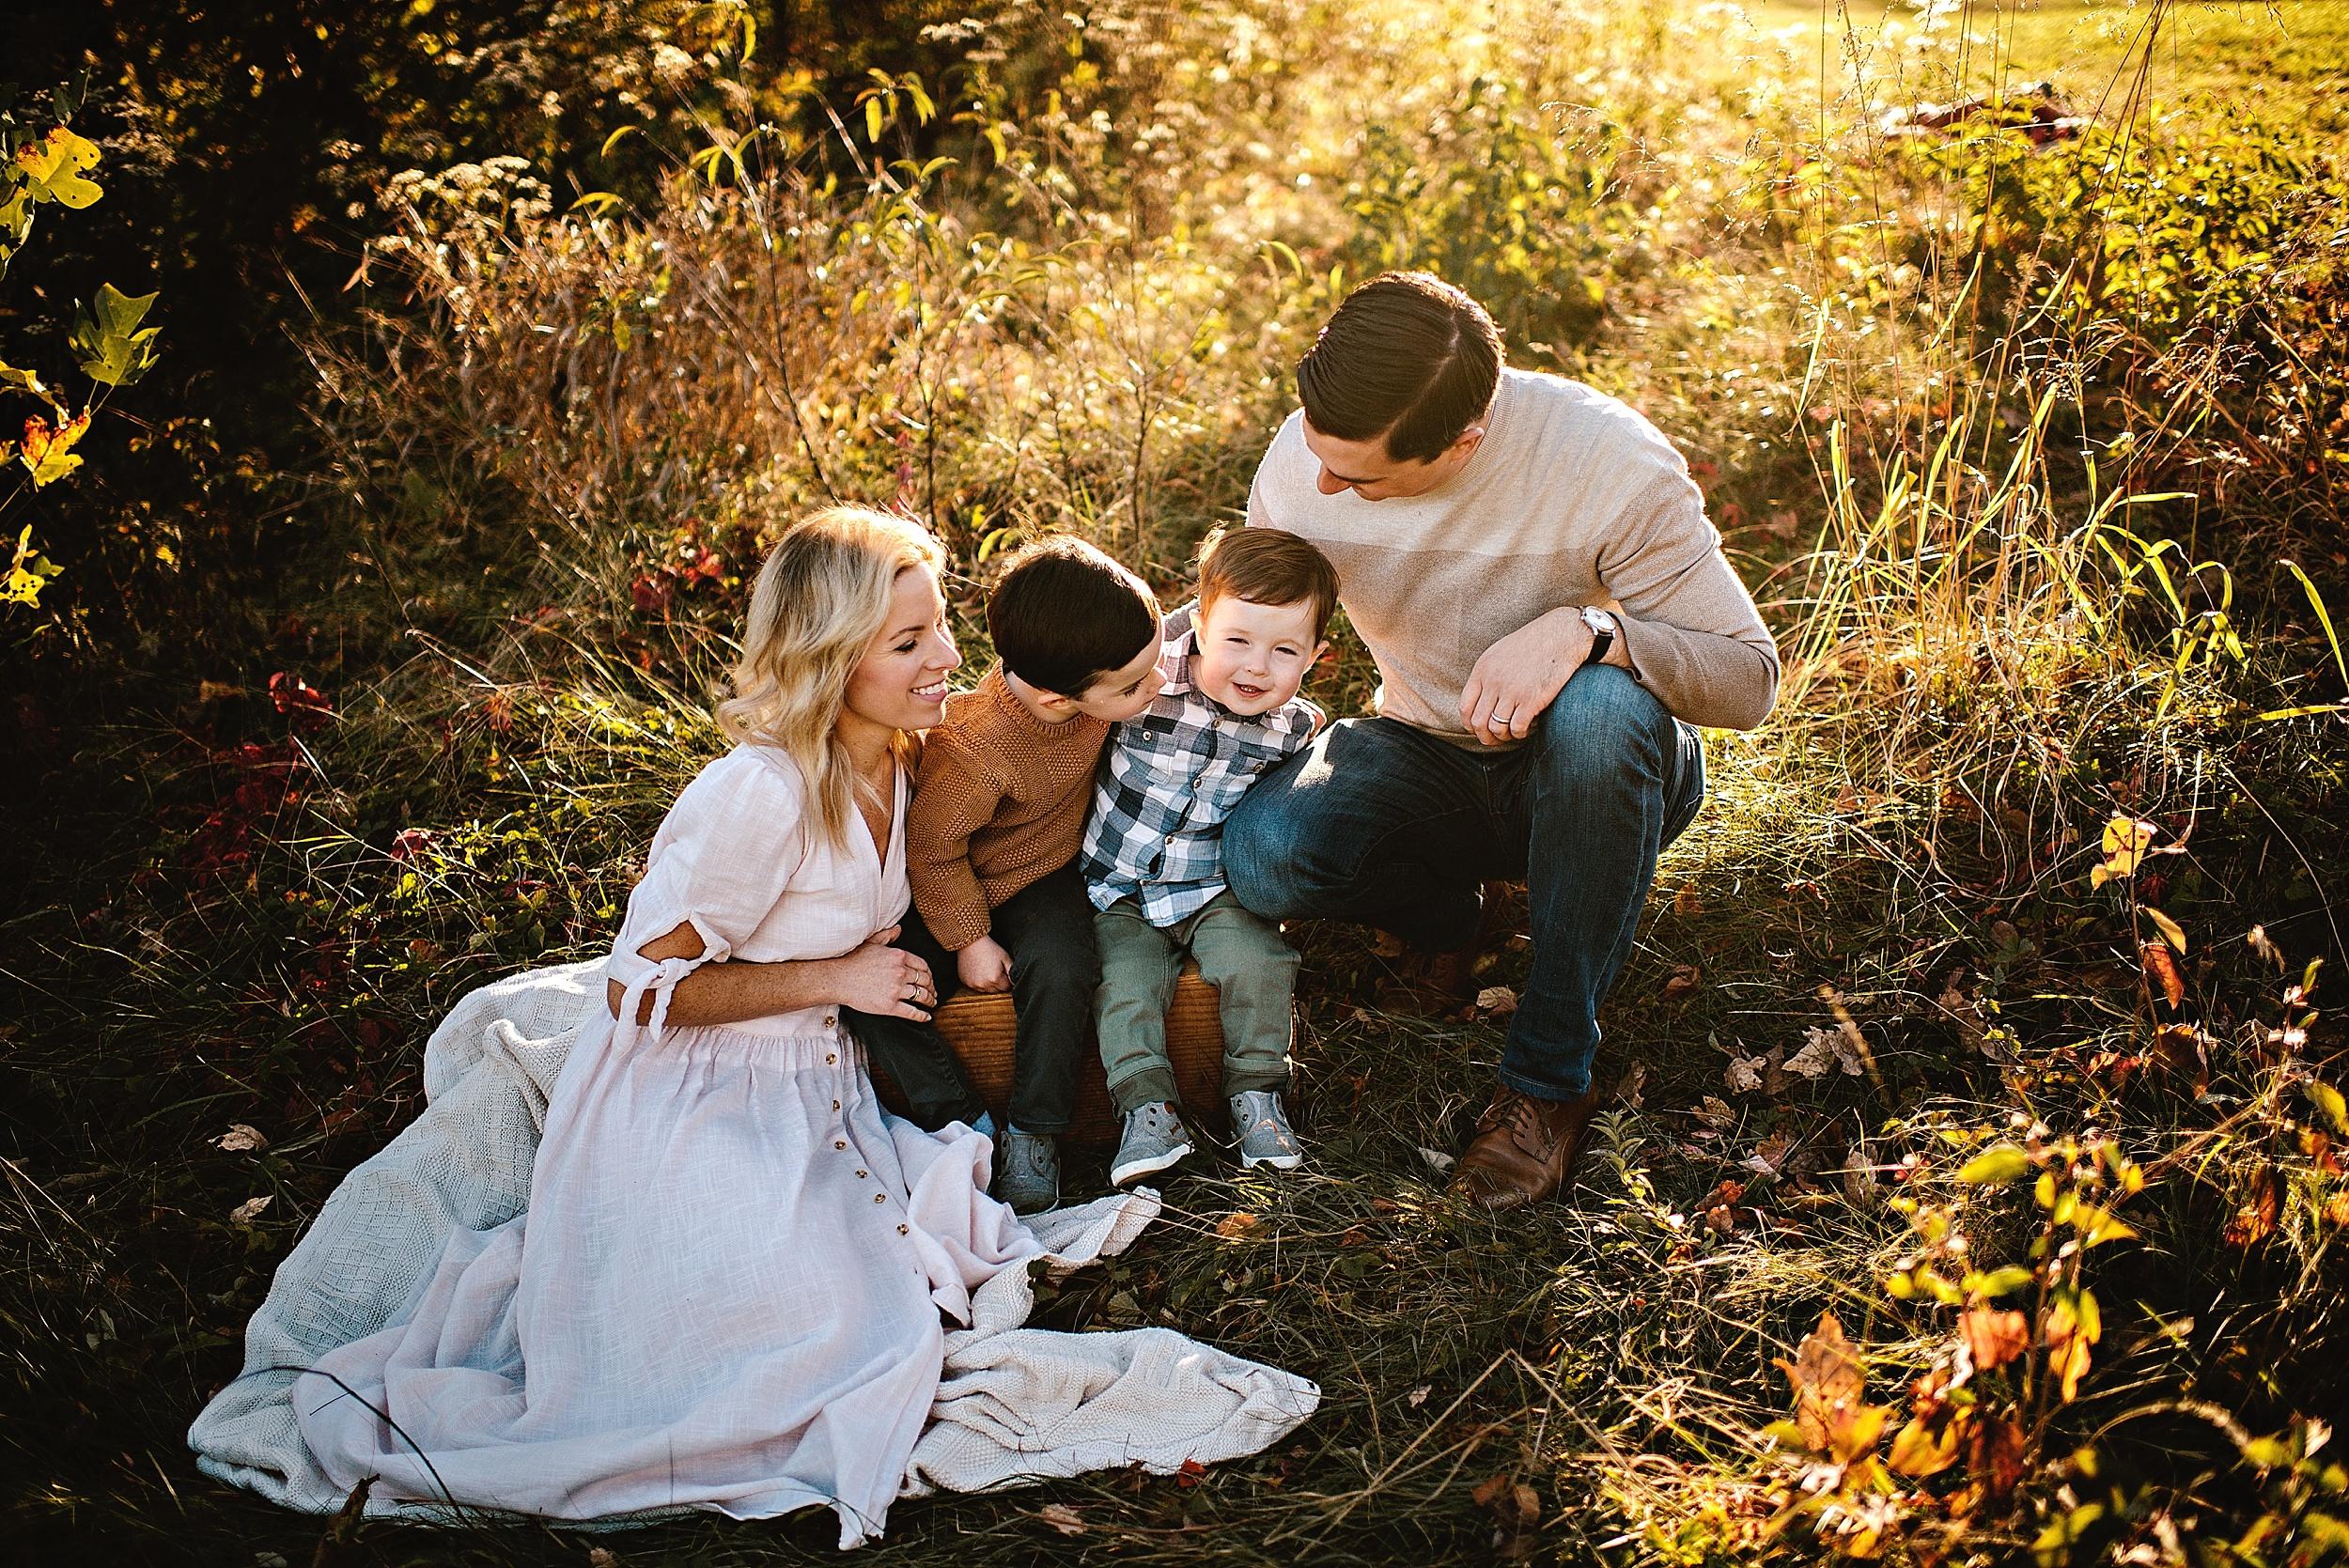 lauren-grayson-photography-portrait-artist-akron-cleveland-ohio-photographer-family-session-fields-sunset-fall_0173.jpg